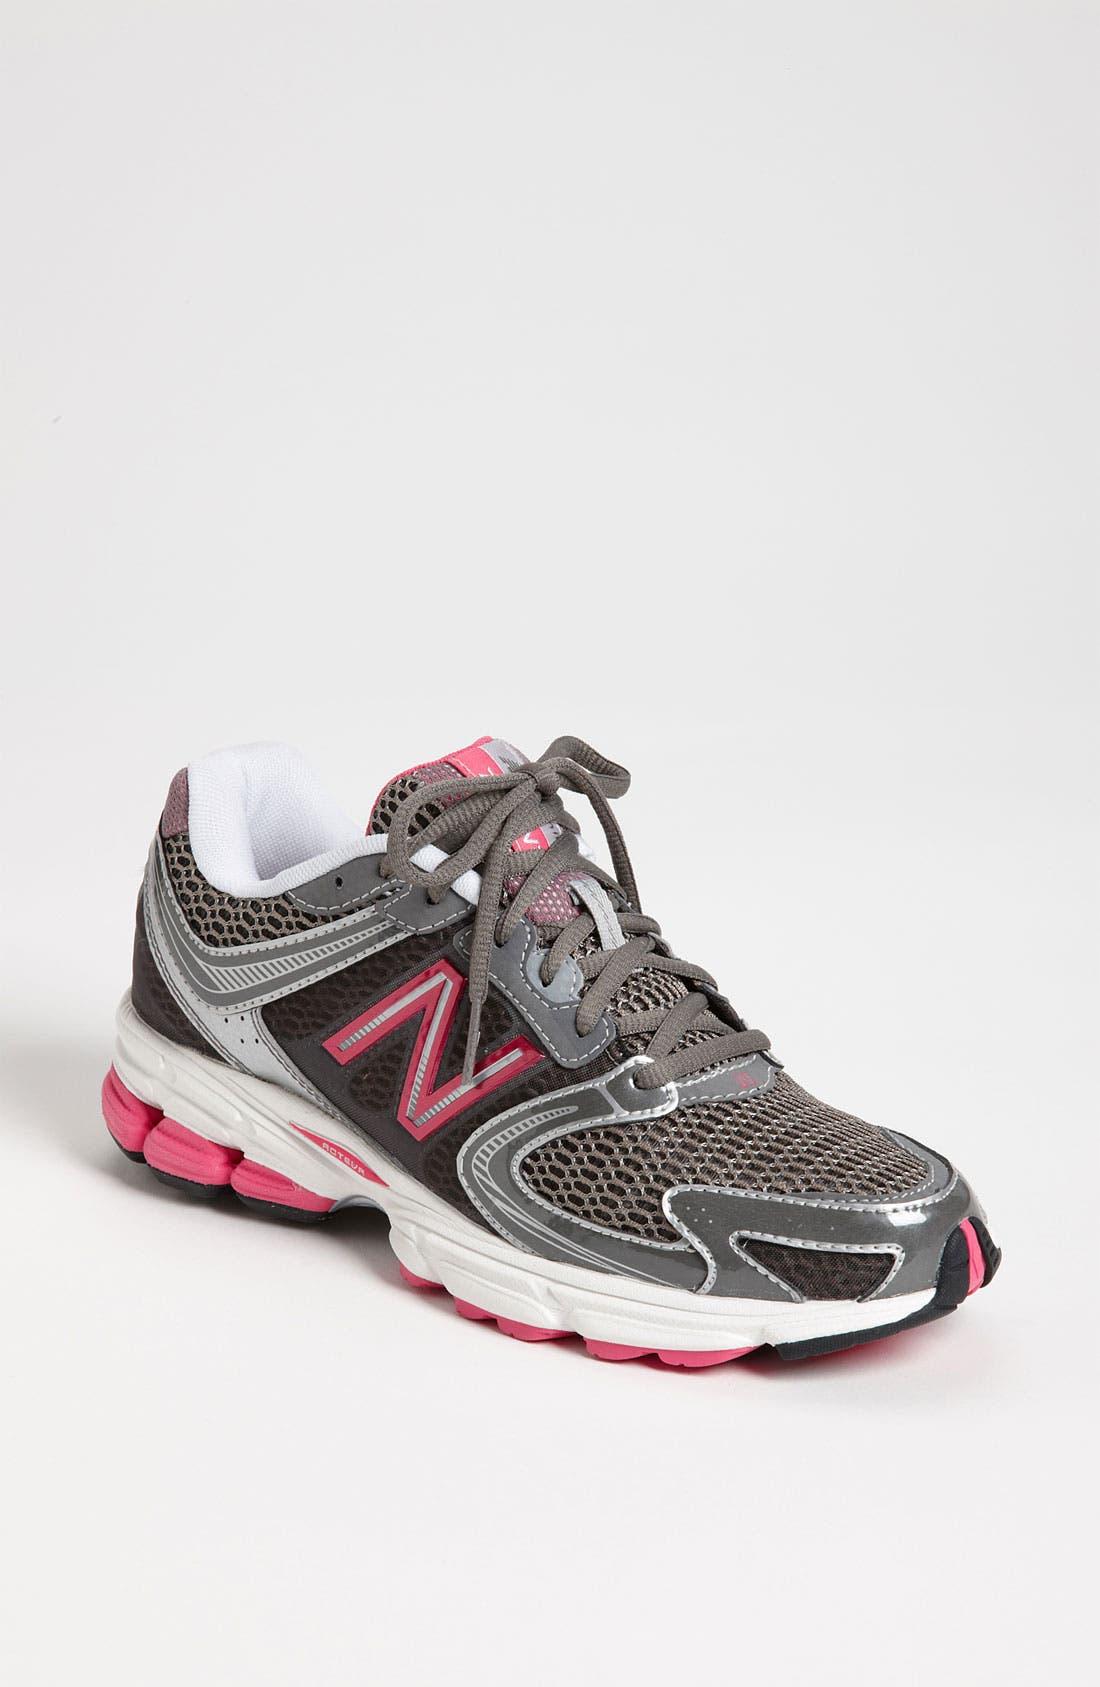 Alternate Image 1 Selected - New Balance '770' Running Shoe (Women)